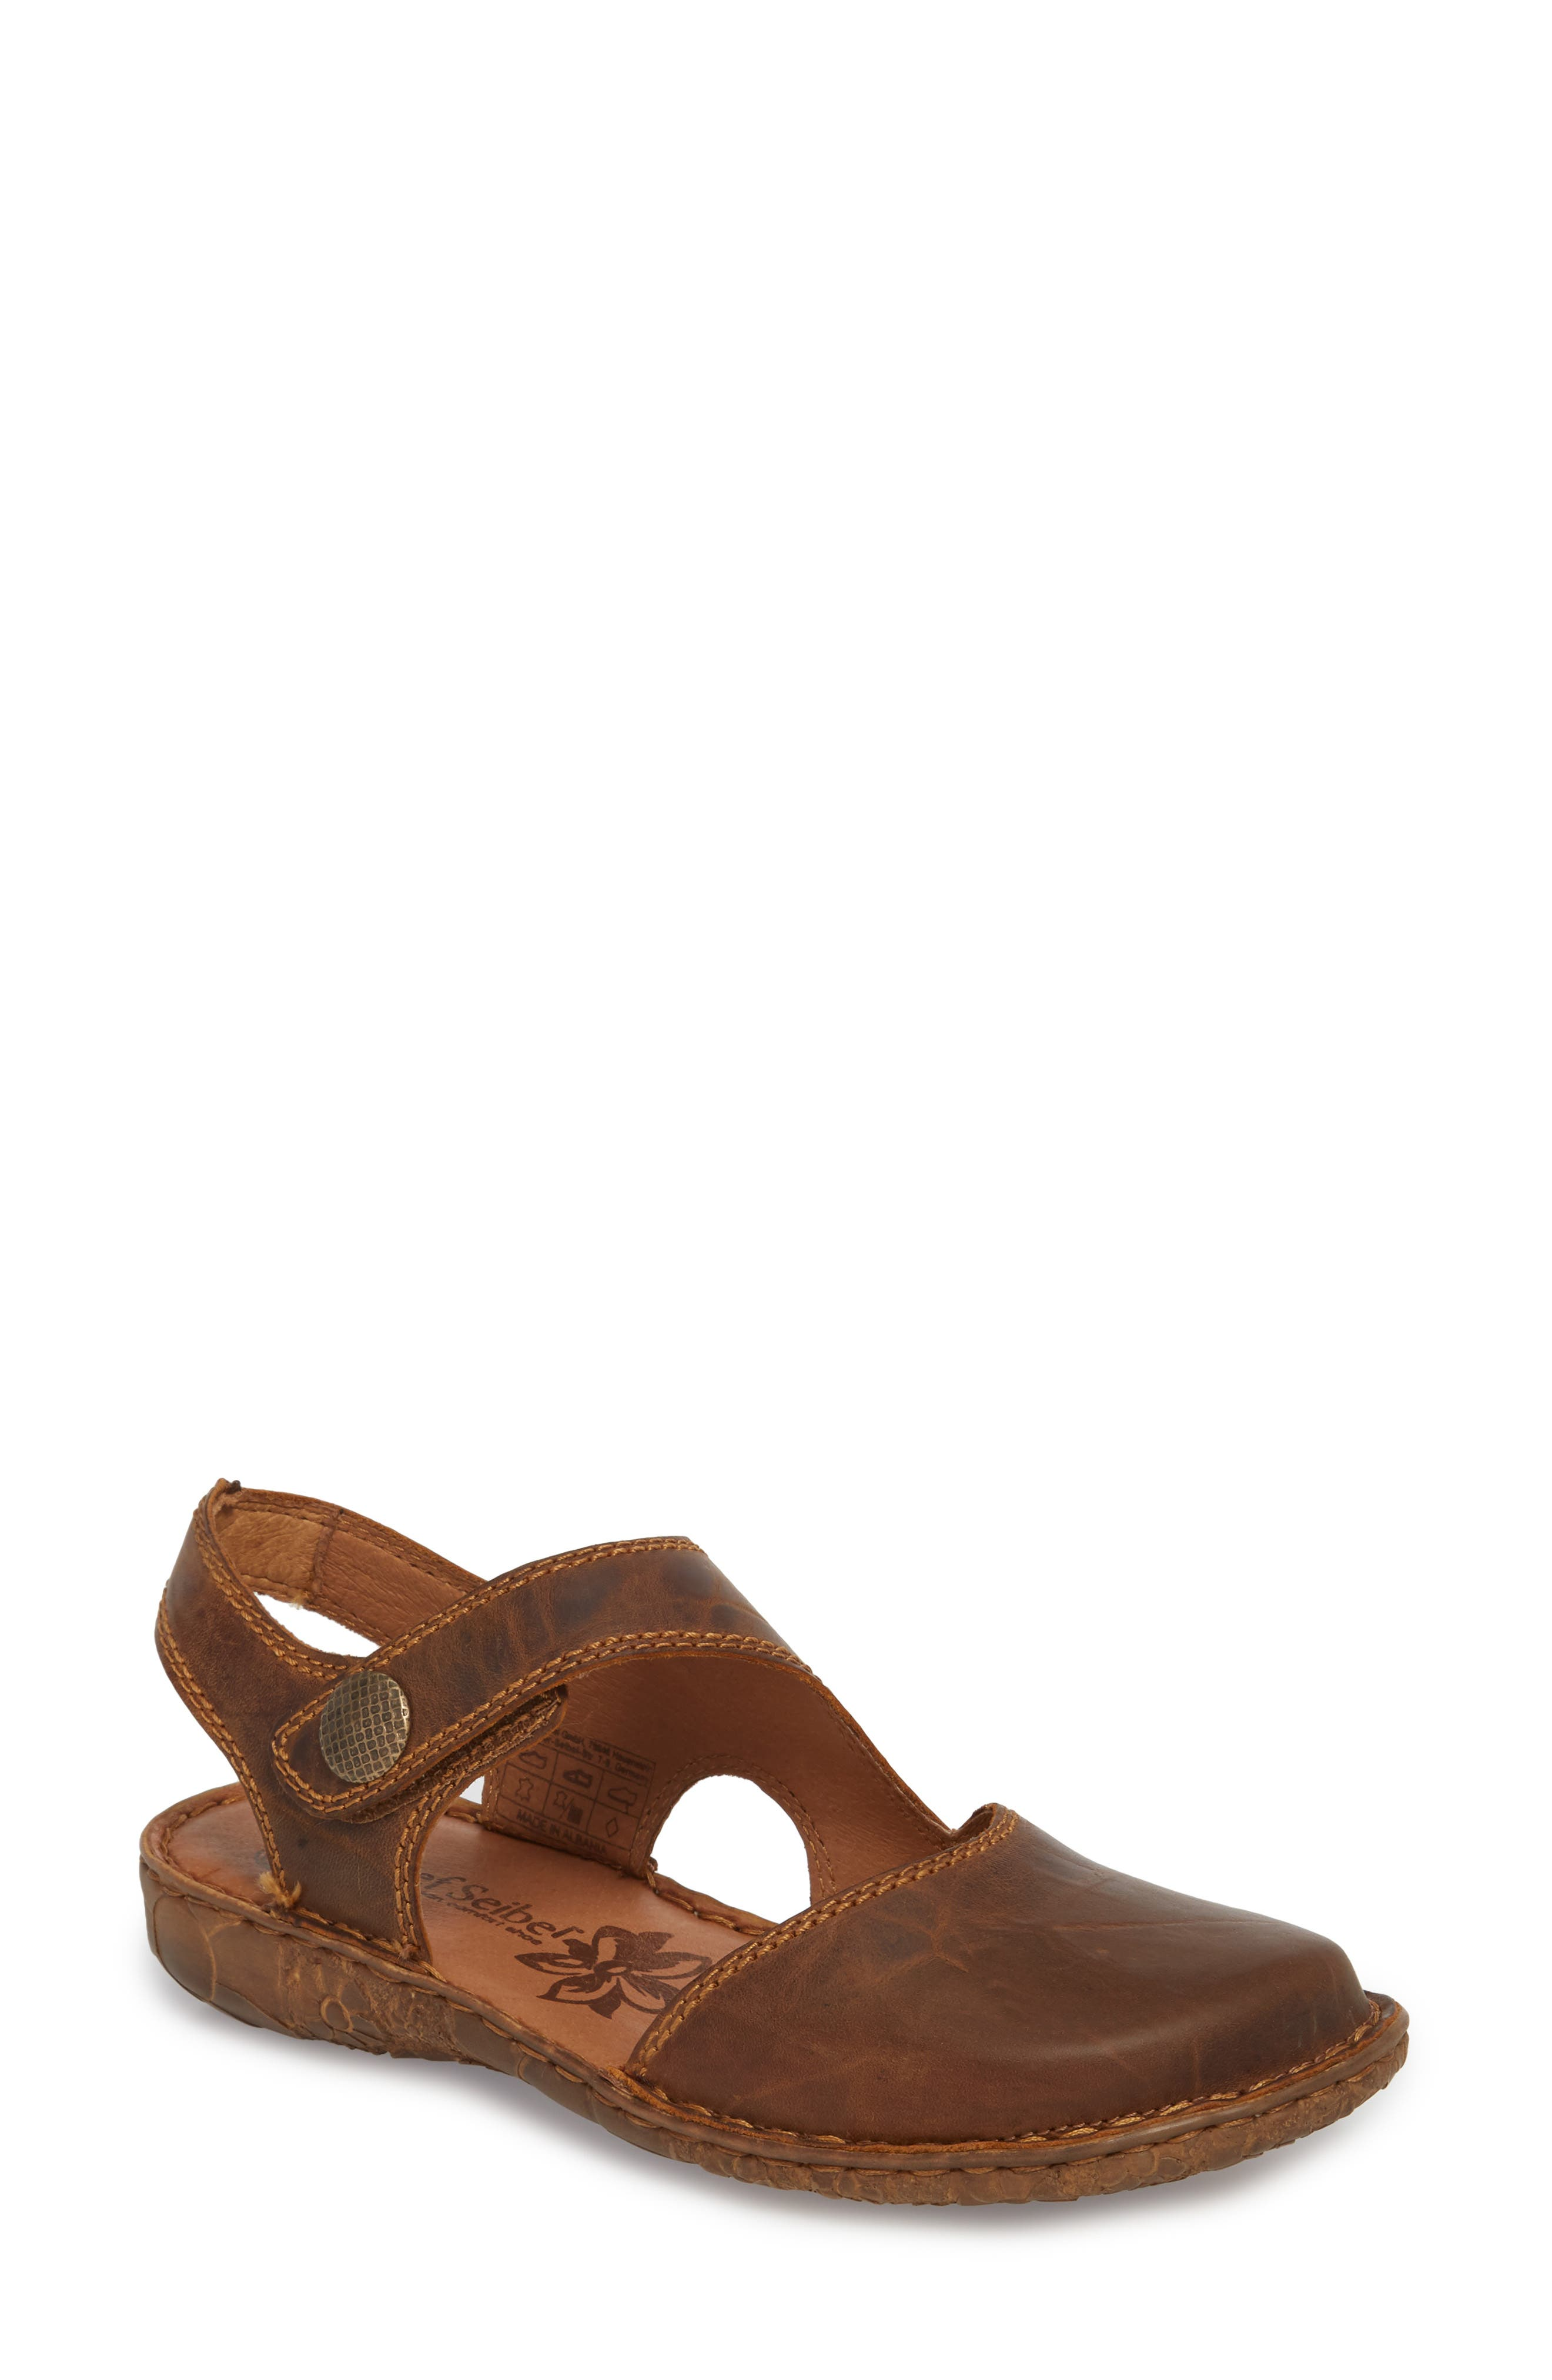 Rosalie 27 Sandal,                         Main,                         color, Brandy Leather